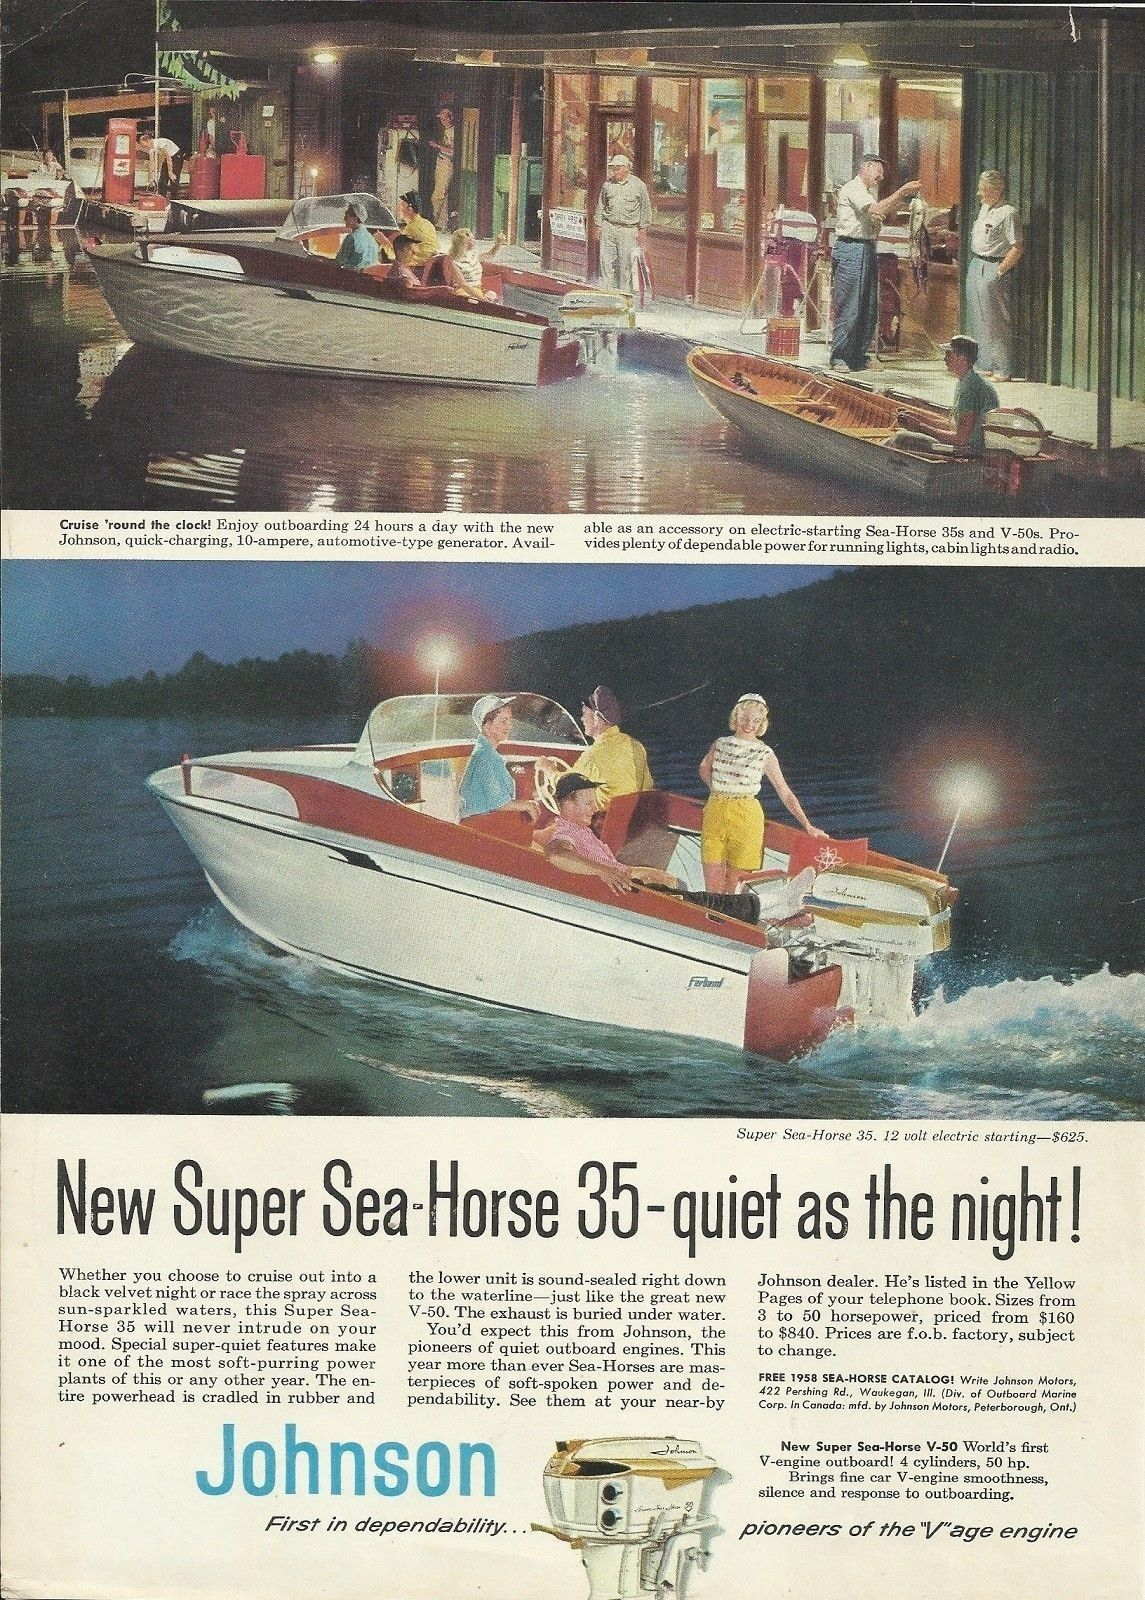 1958 johnson motors color ad the super sea horse 35 hp outboard motor [ 1145 x 1600 Pixel ]